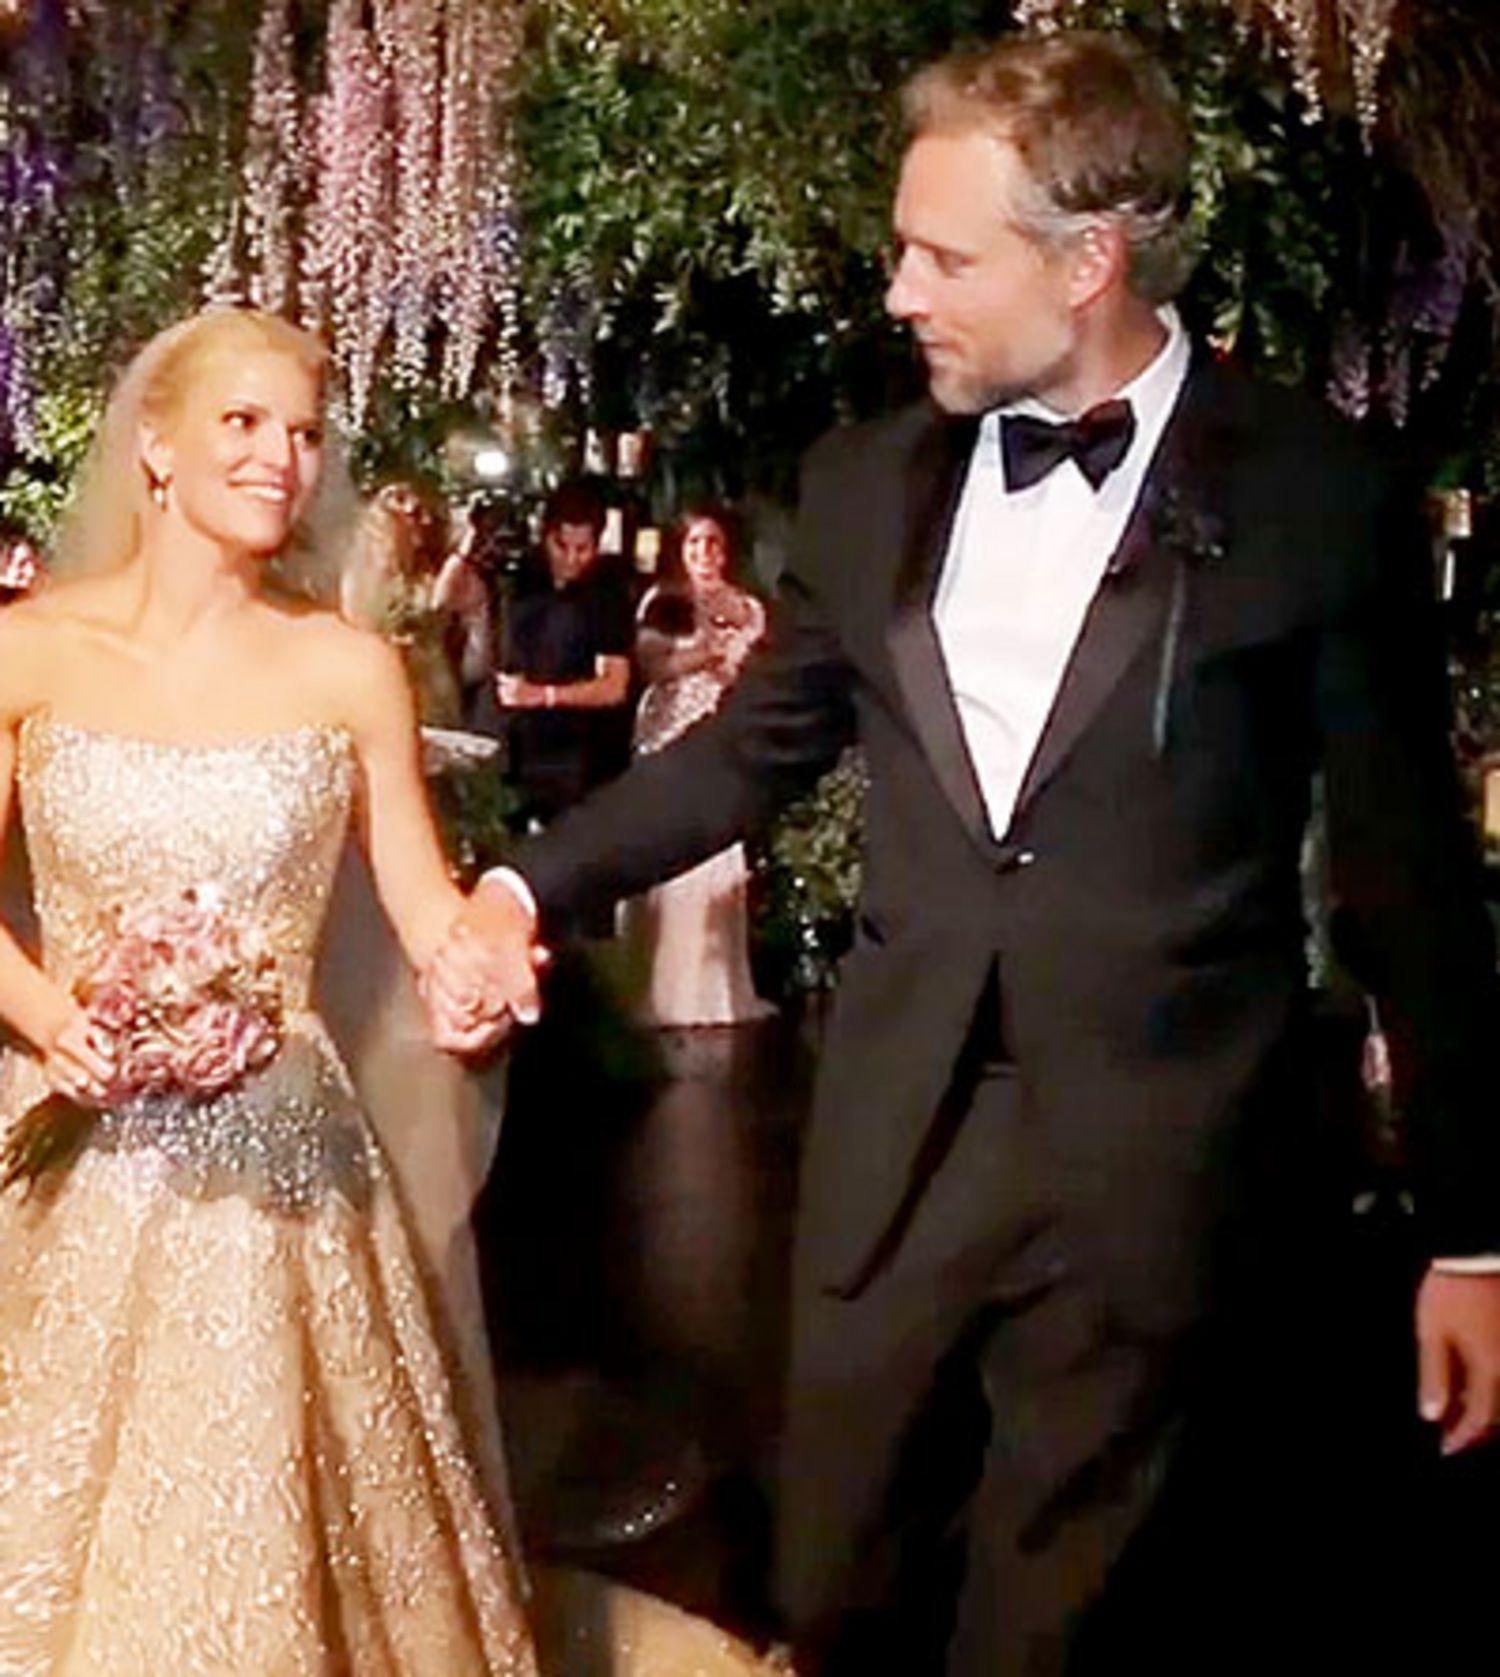 jessica-simpson-wedding-video-pictures-0714-main.jpg